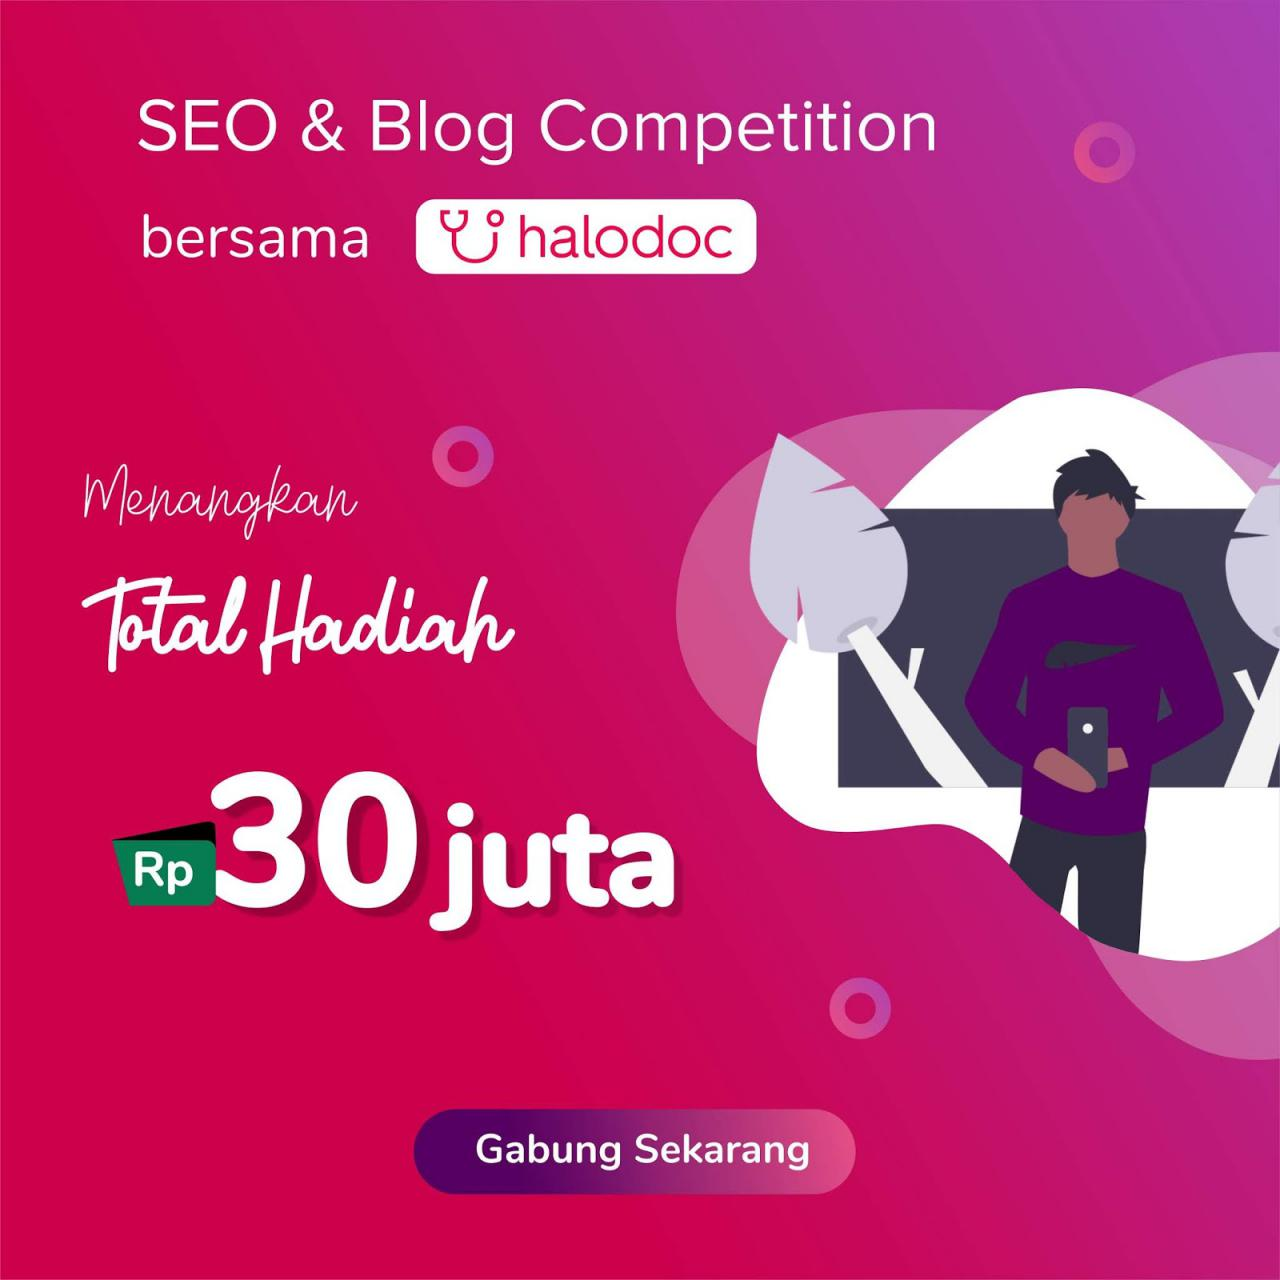 HALODOC - SEO & Blog Review Contest 2019